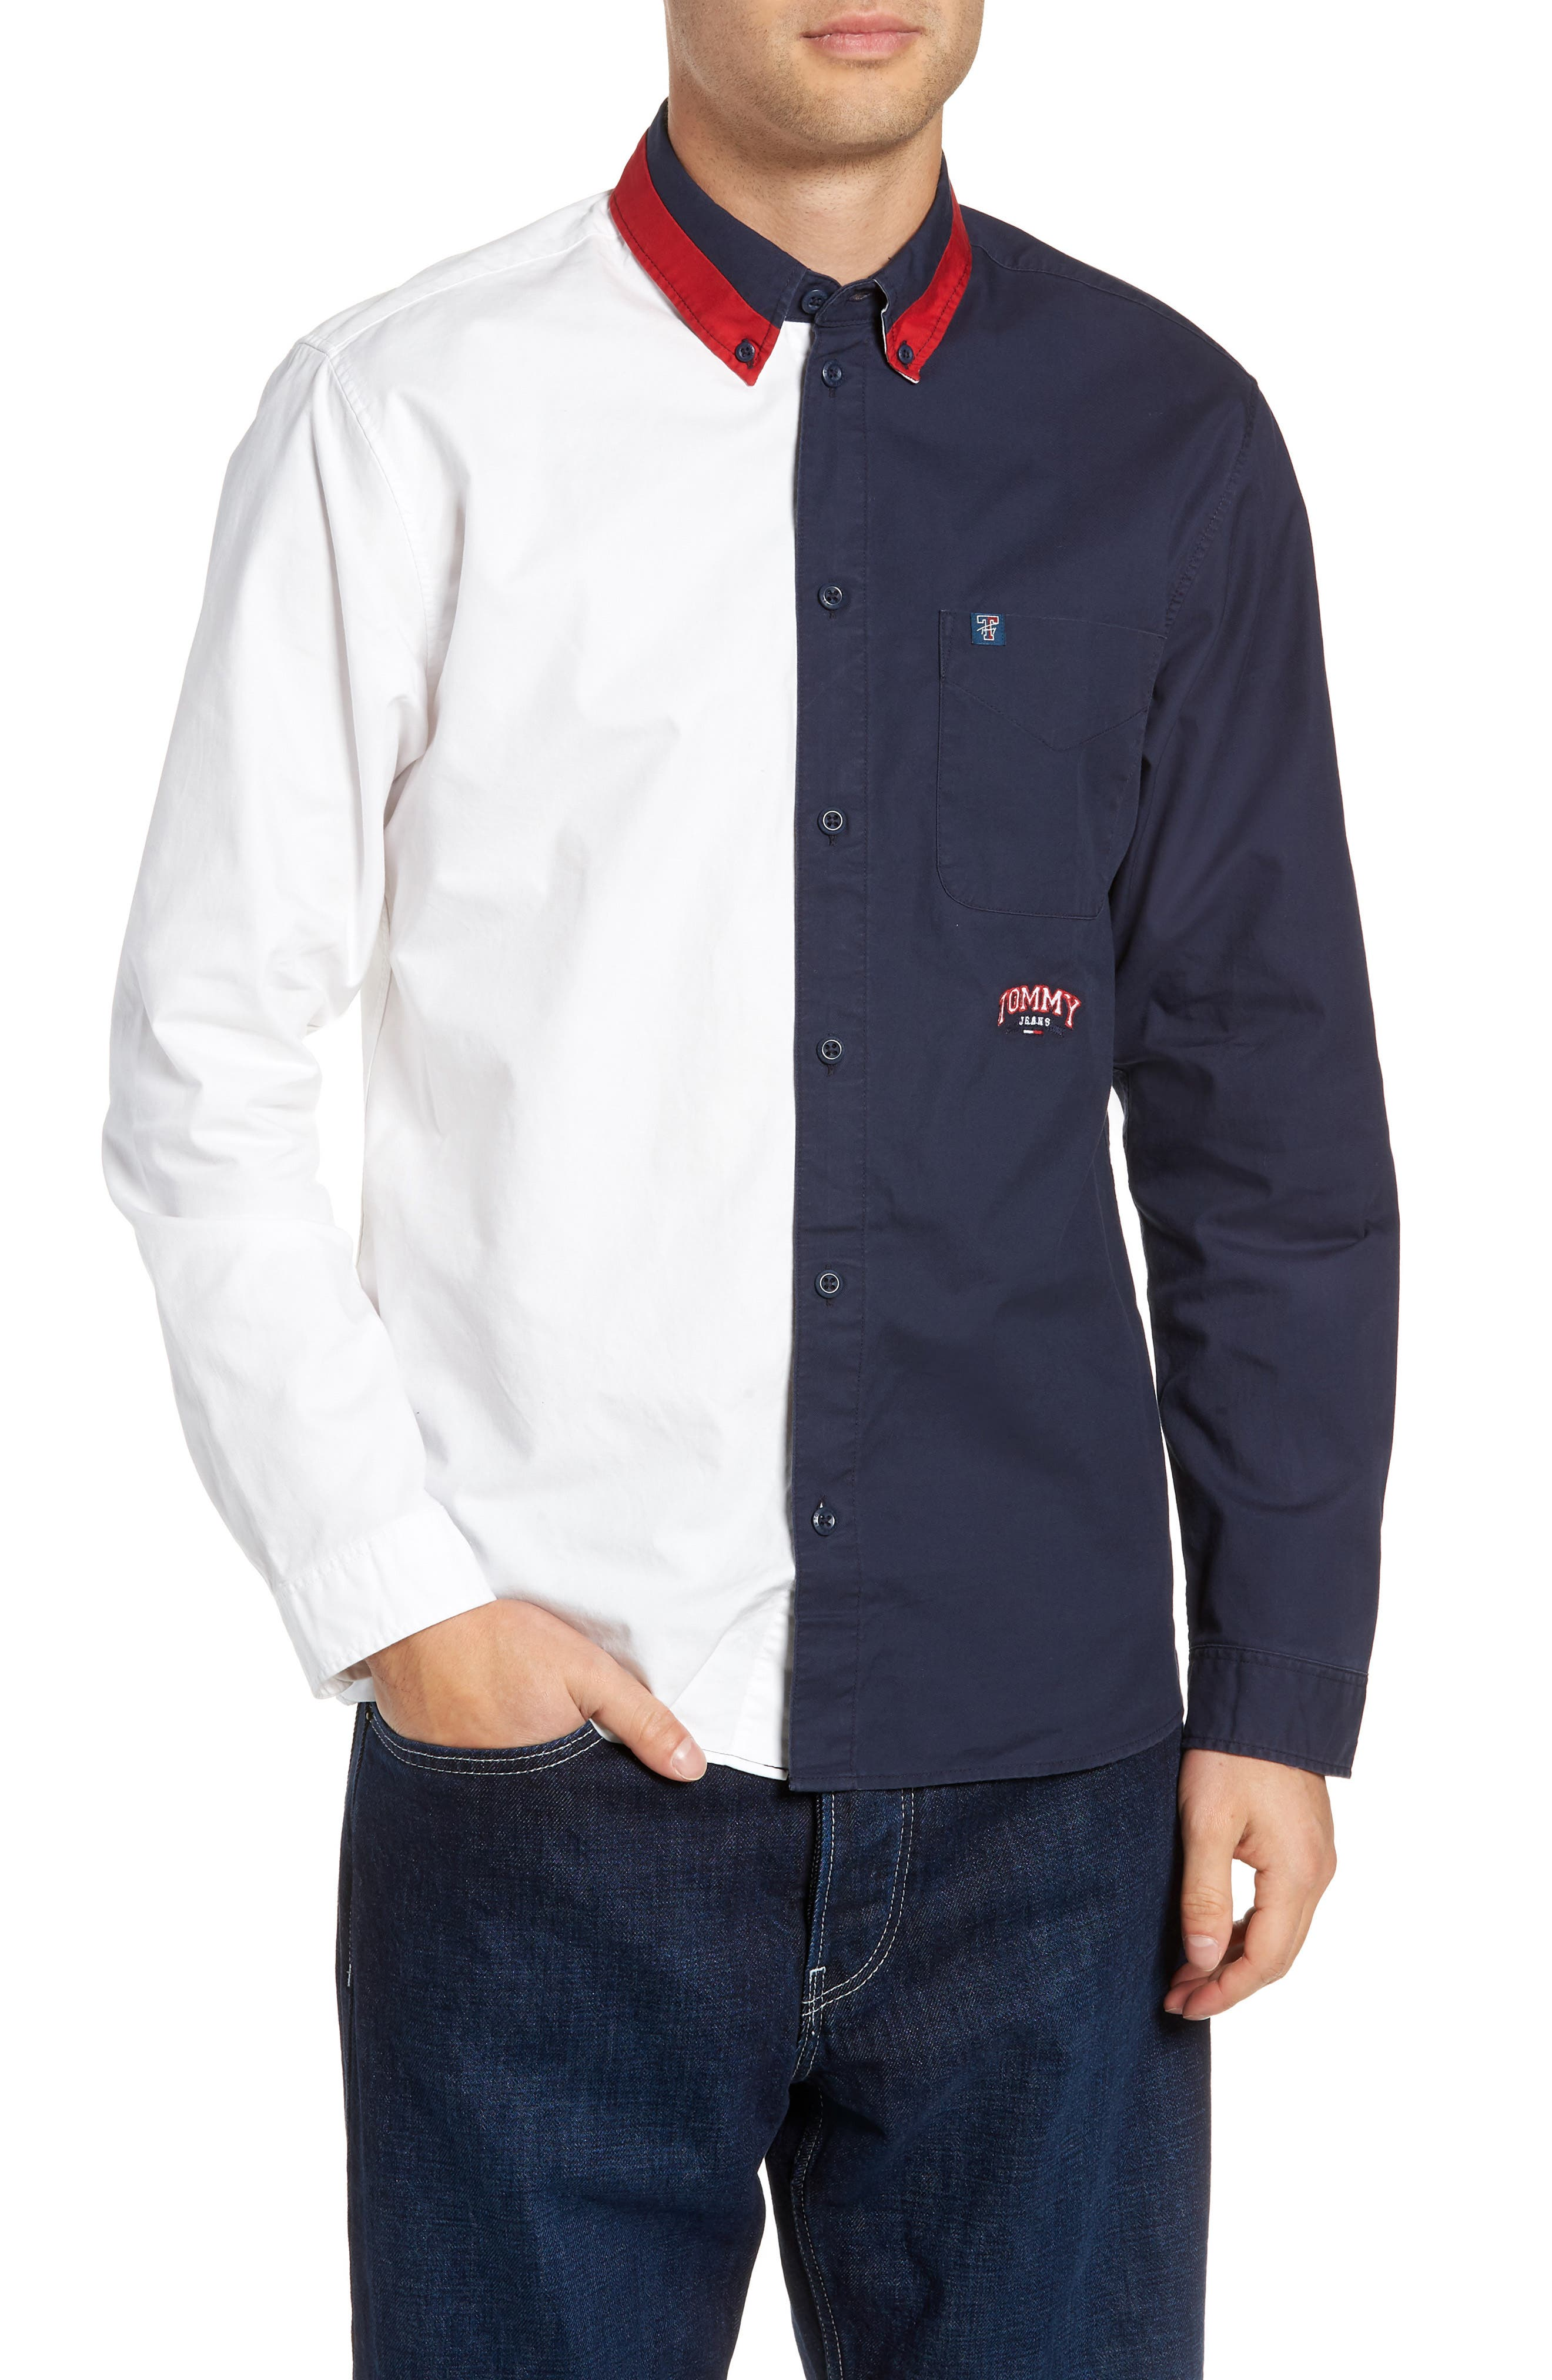 Half & Half Shirt,                         Main,                         color, CLASSIC WHITE / BLACK IRIS